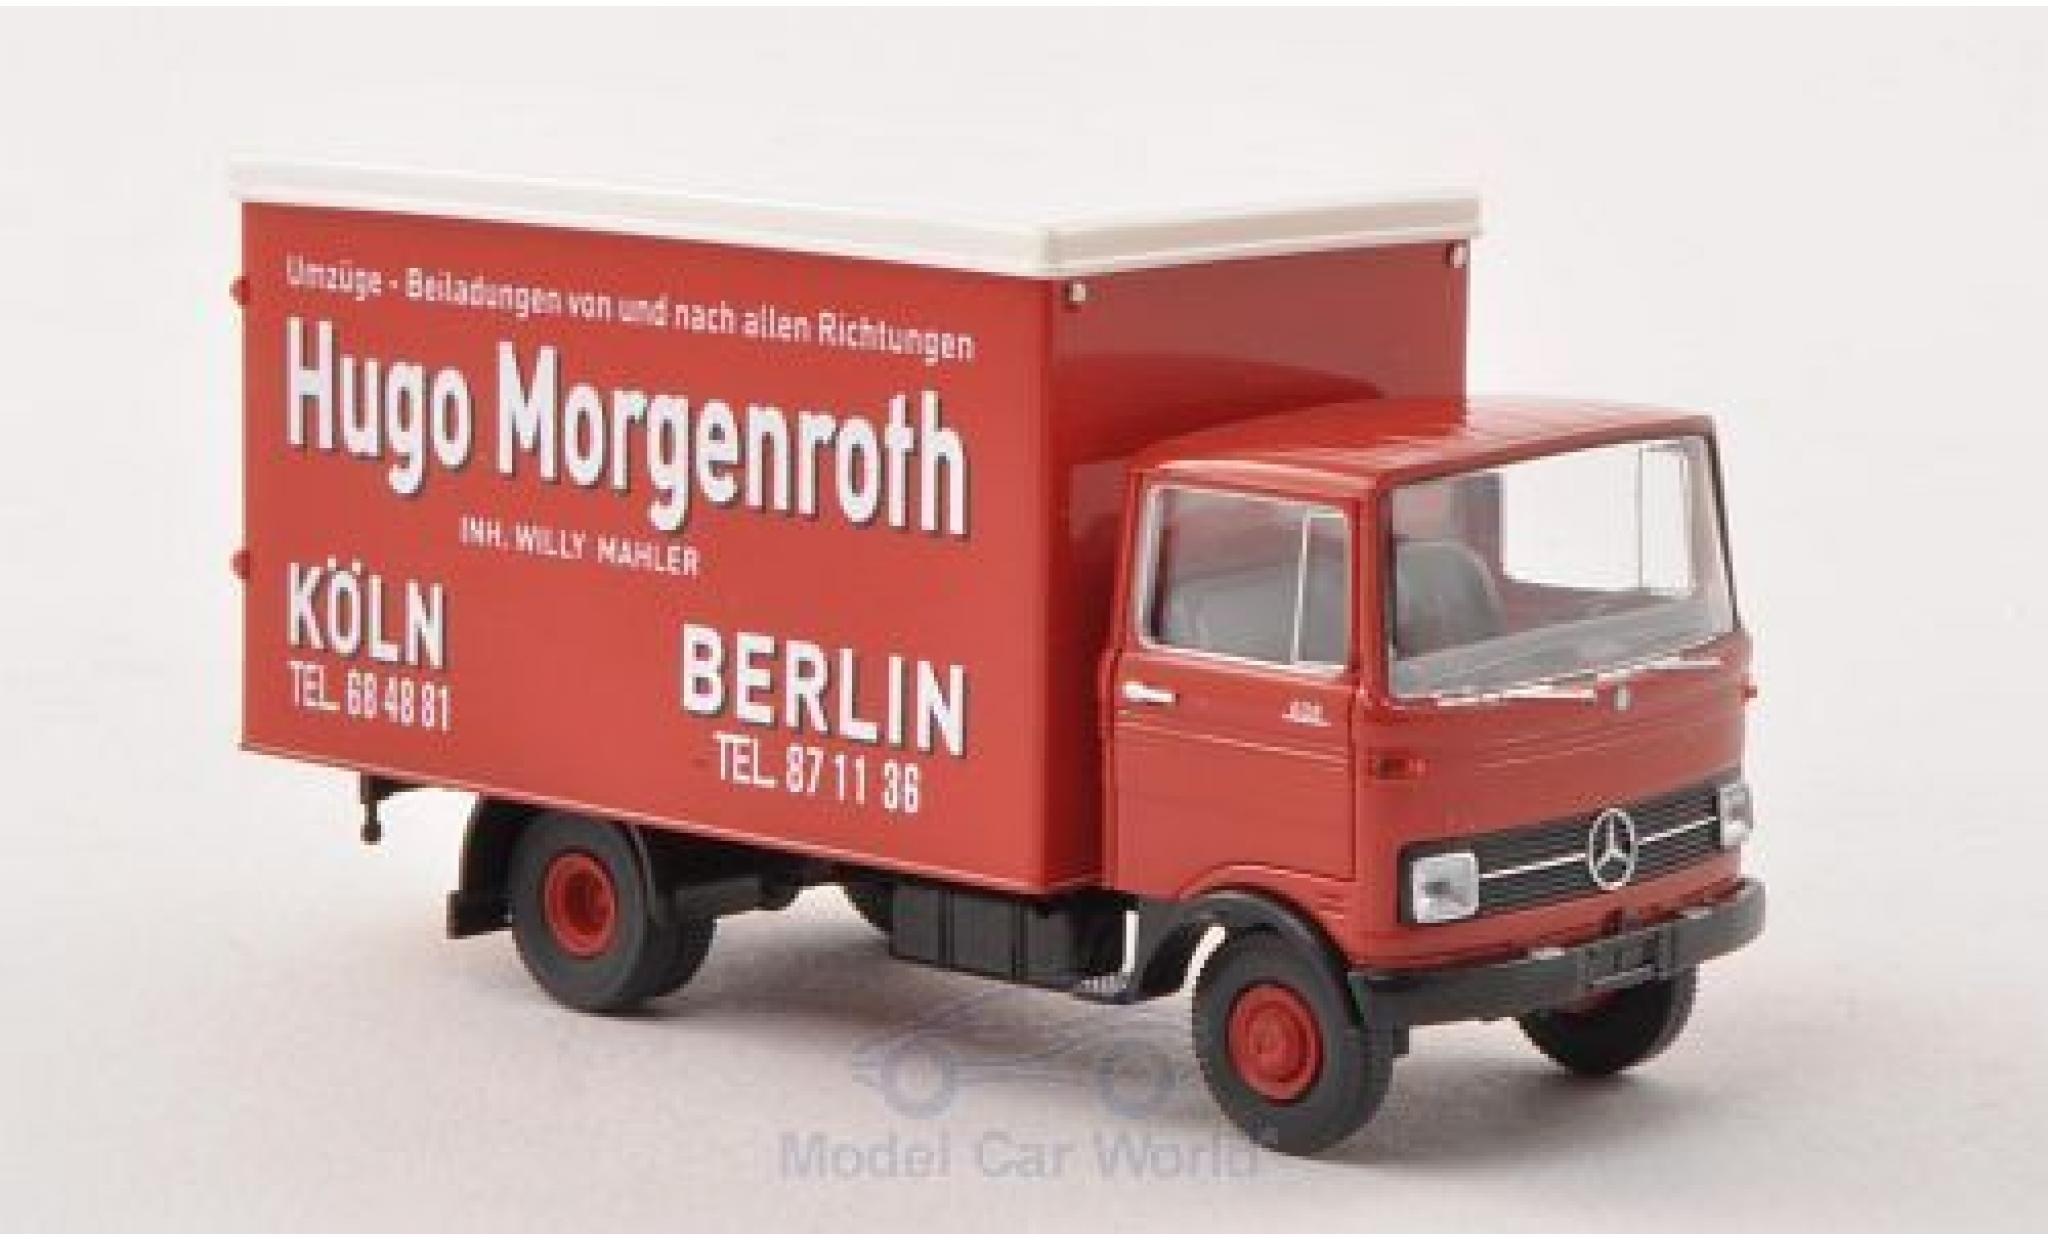 Mercedes LP 608 1/87 Brekina Hugo Morgenrougeh -